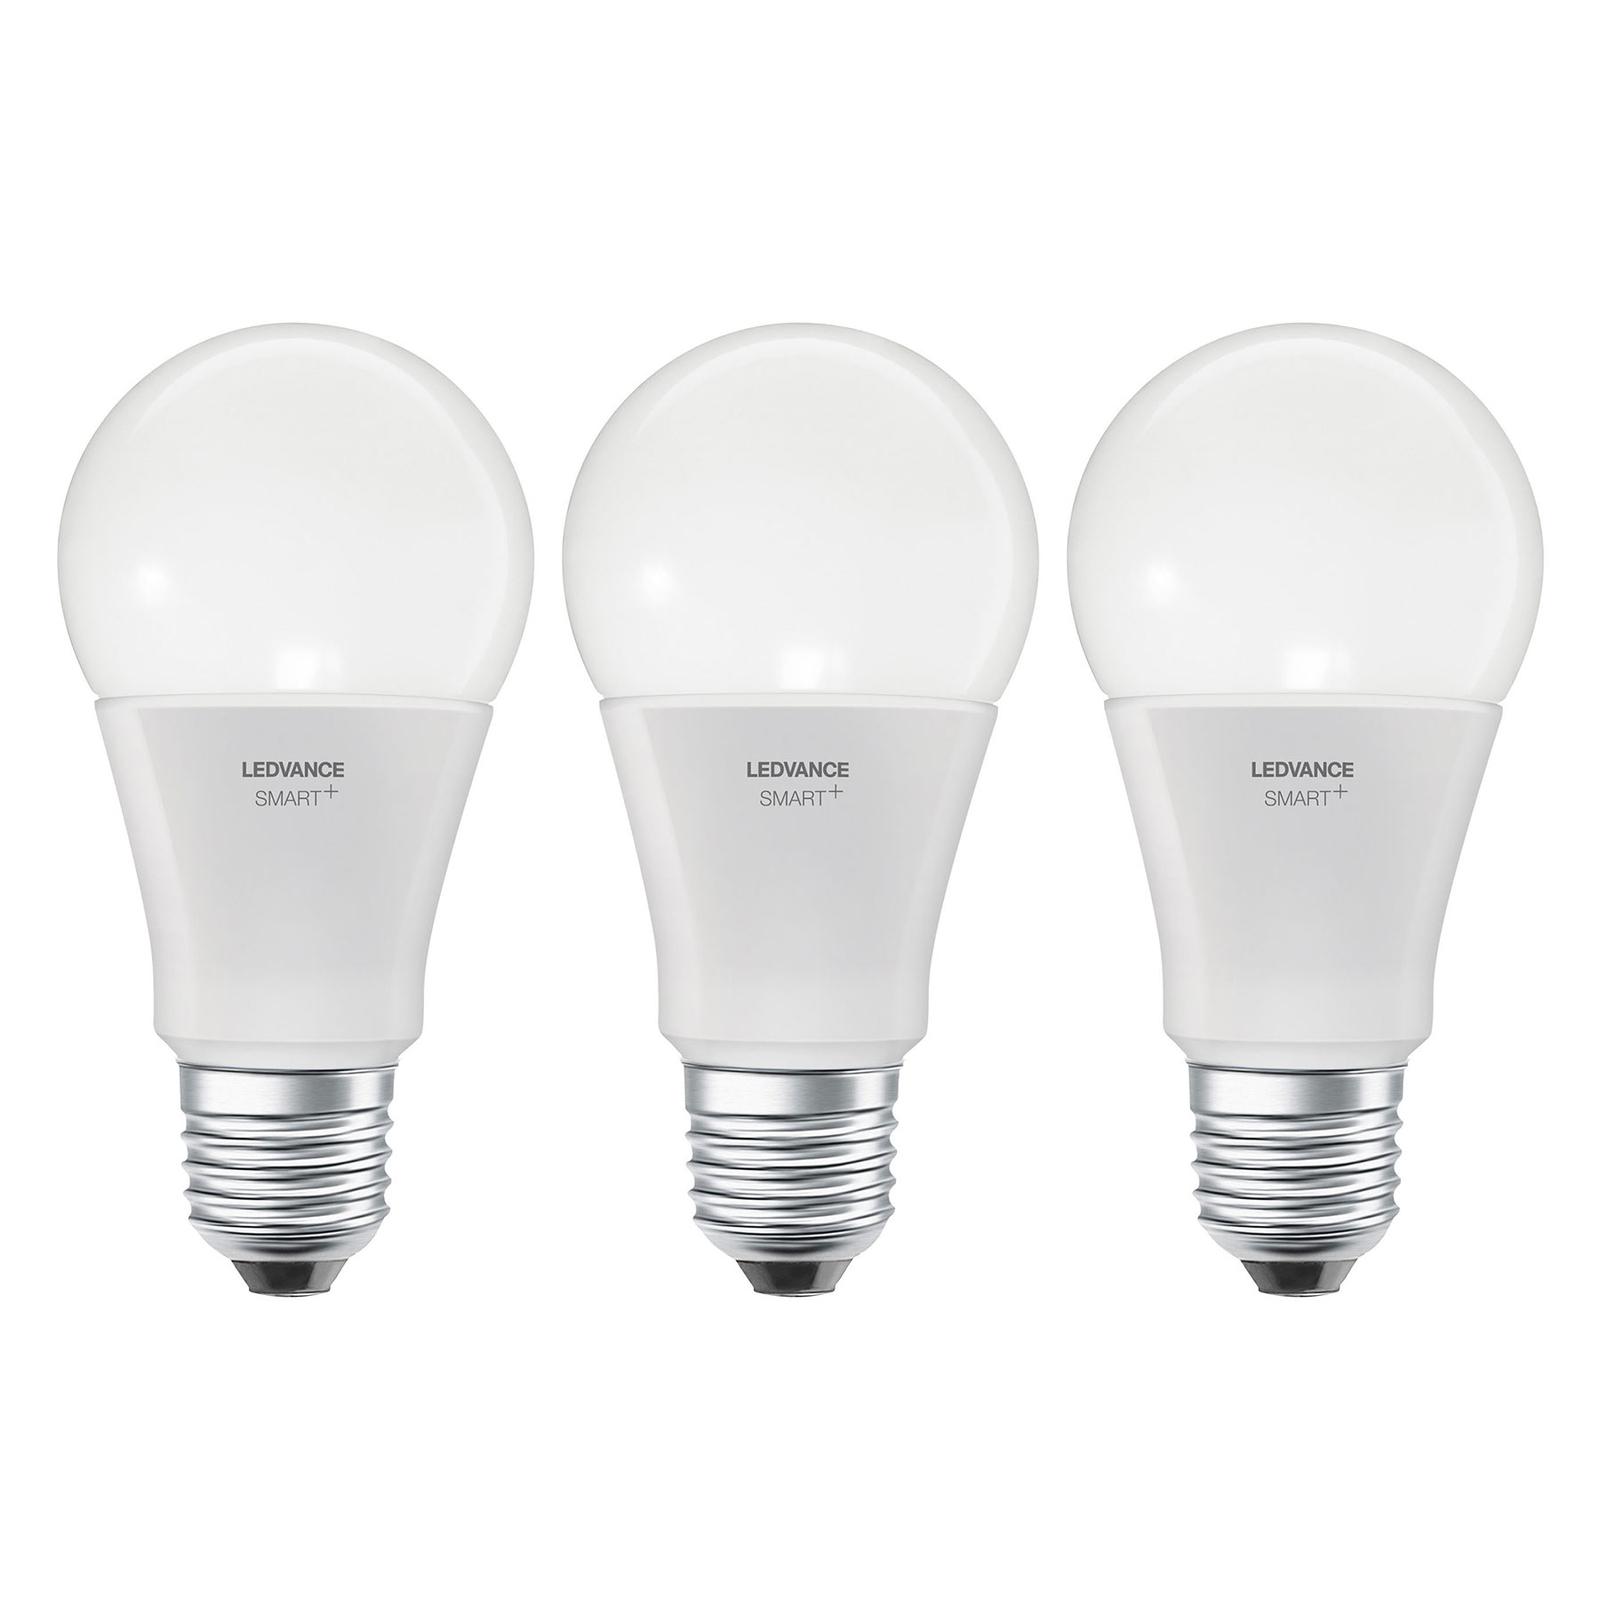 LEDVANCE SMART+ WiFi E27 9 W Classic CCT 3-pack